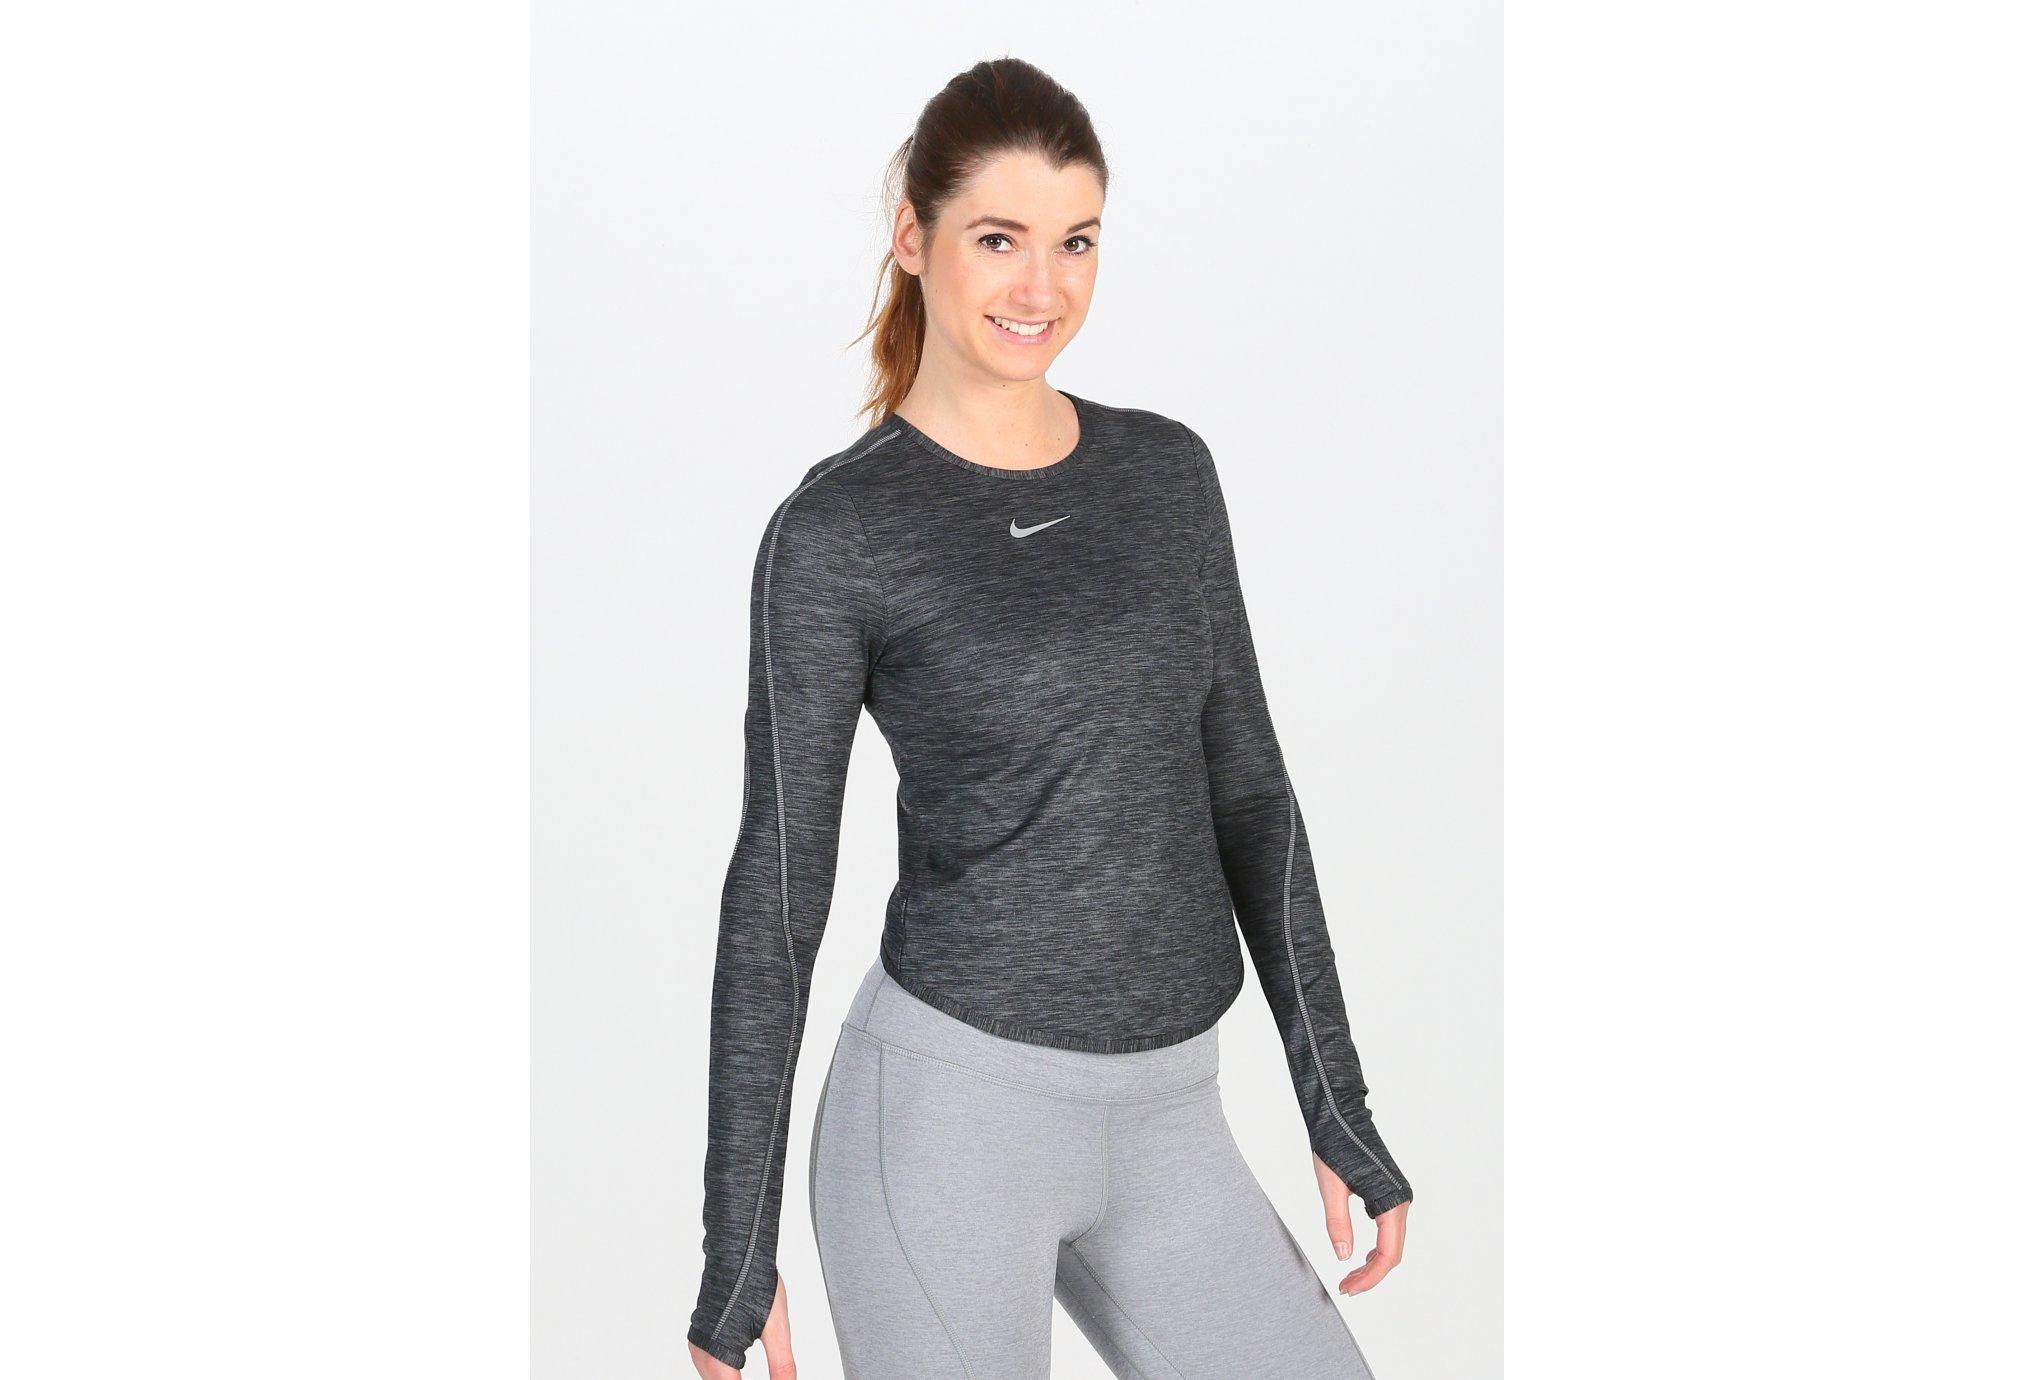 Nike Runway Reflective W Diététique Vêtements femme